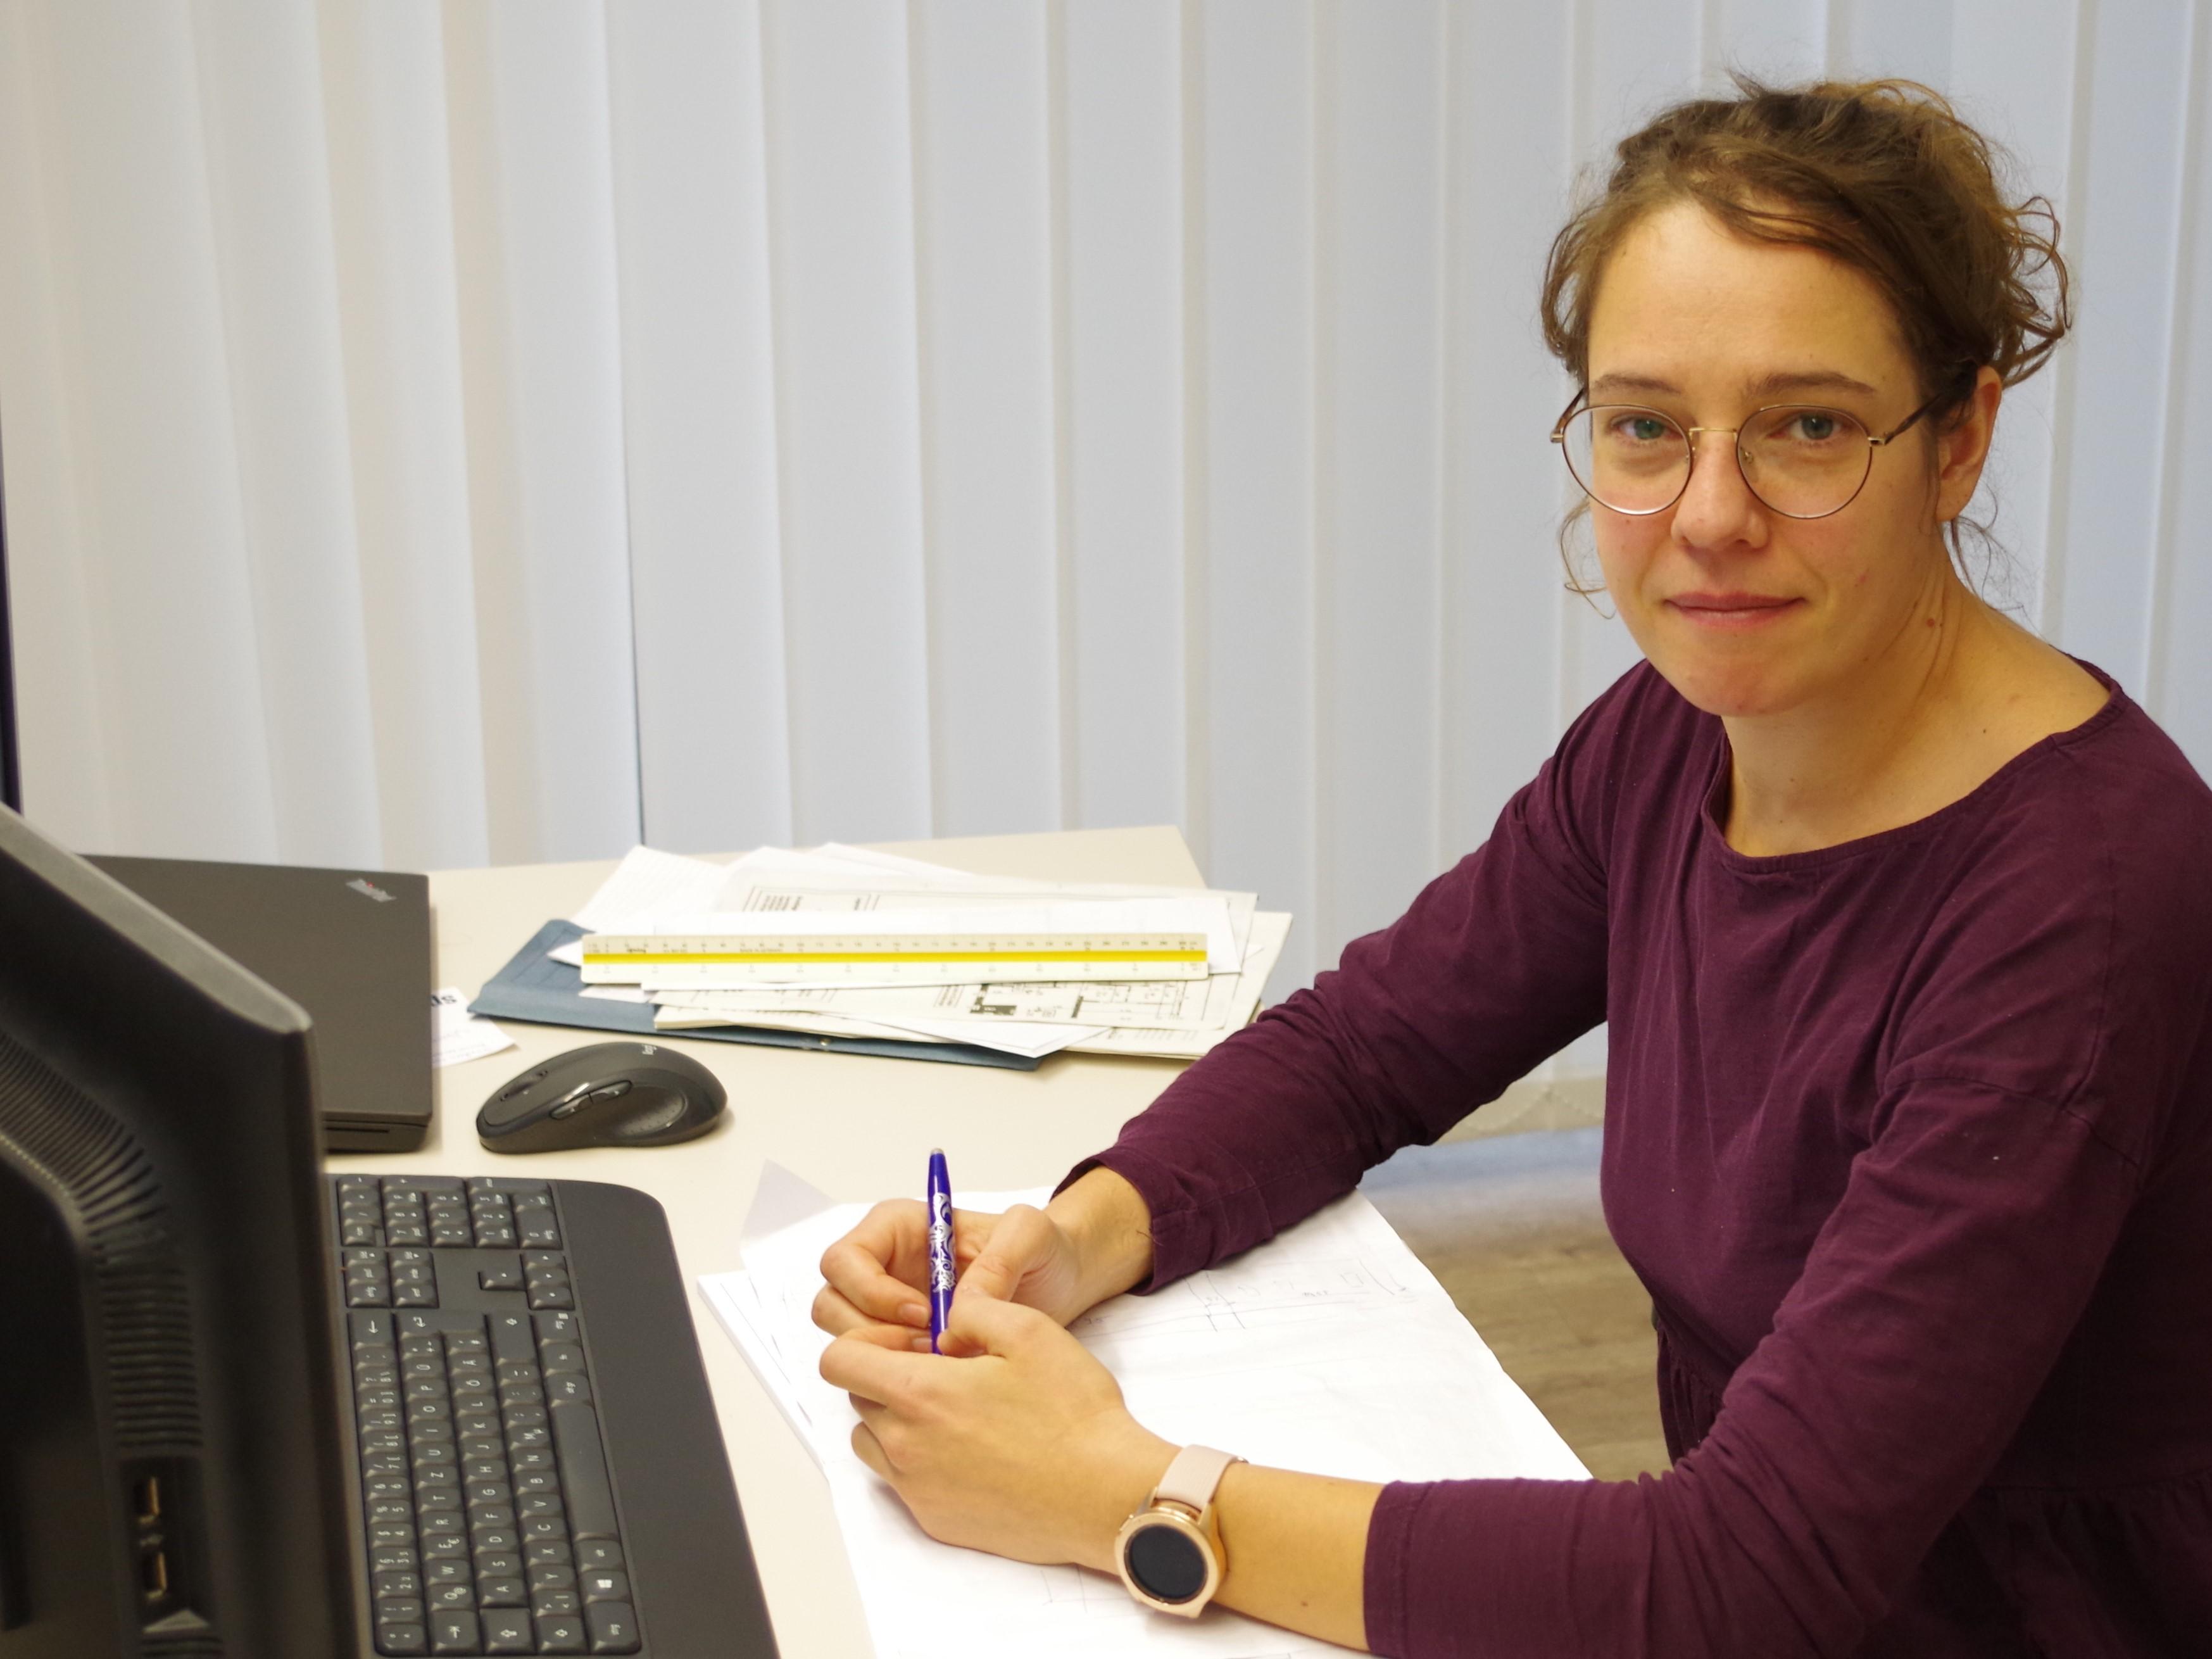 M. Eng. Melanie Gründig